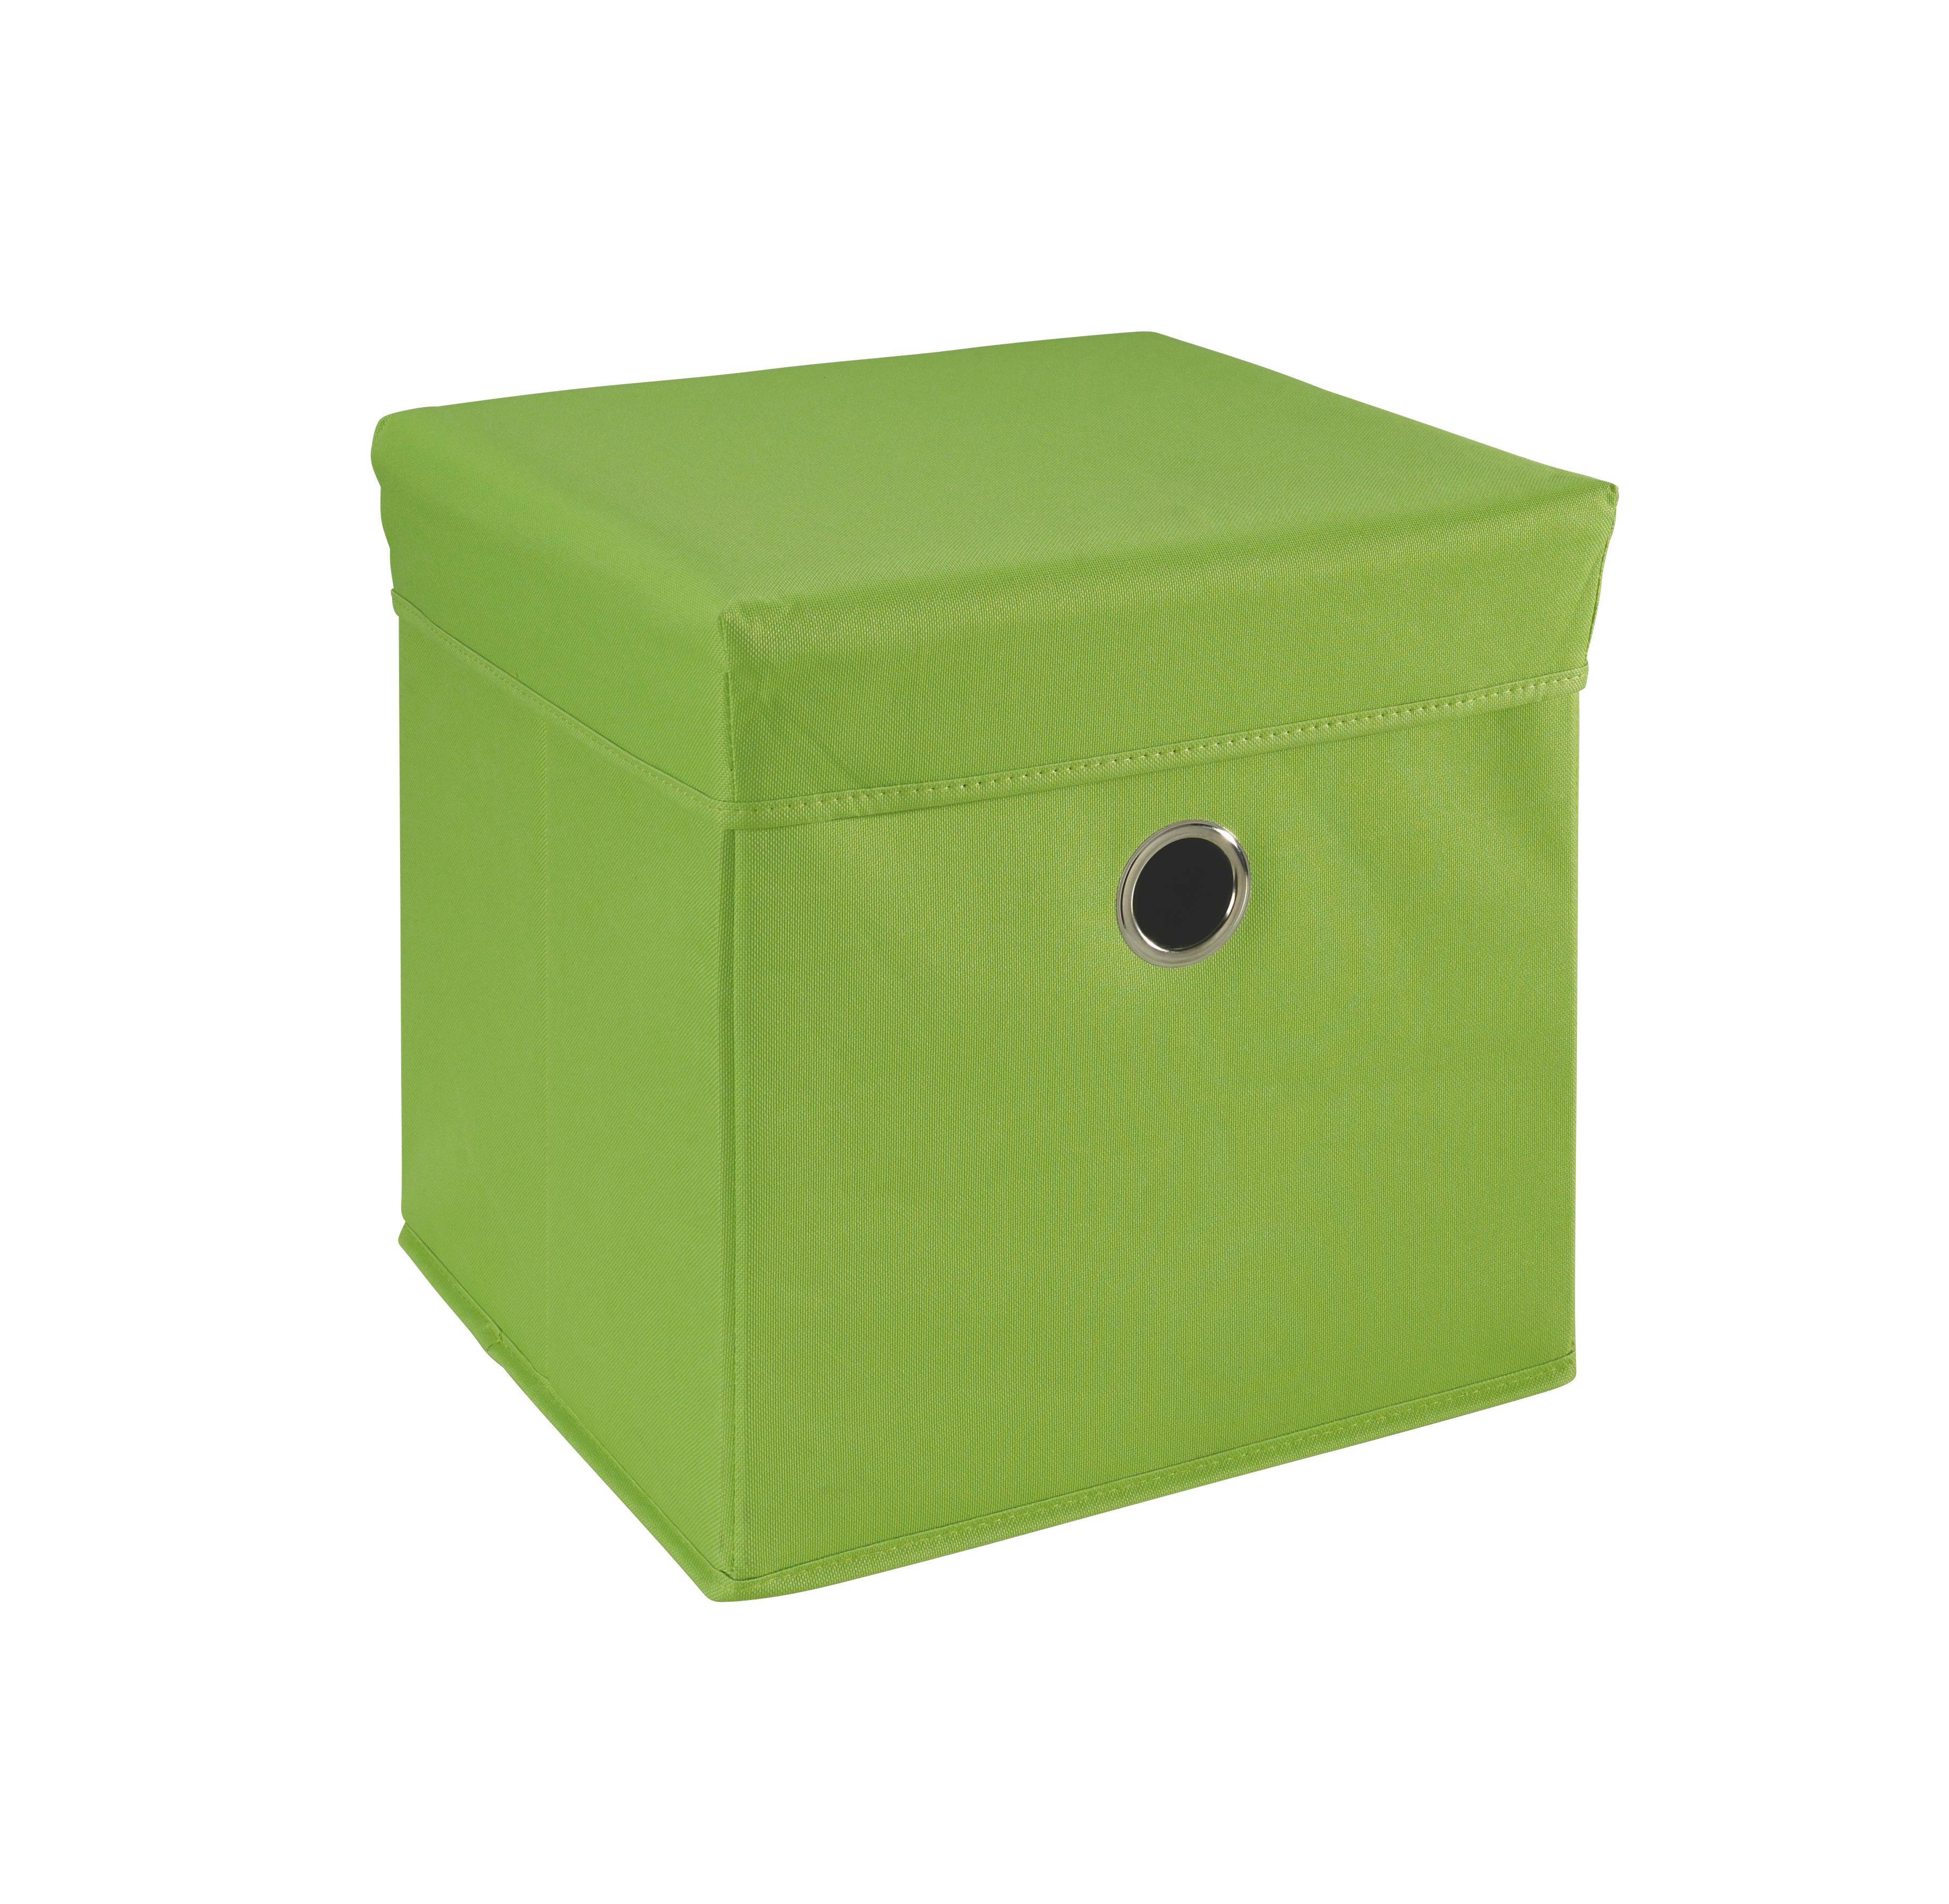 LEKSAKSLÅDA - grön, Basics, trä/textil (32/32/32cm) - MY BABY LOU